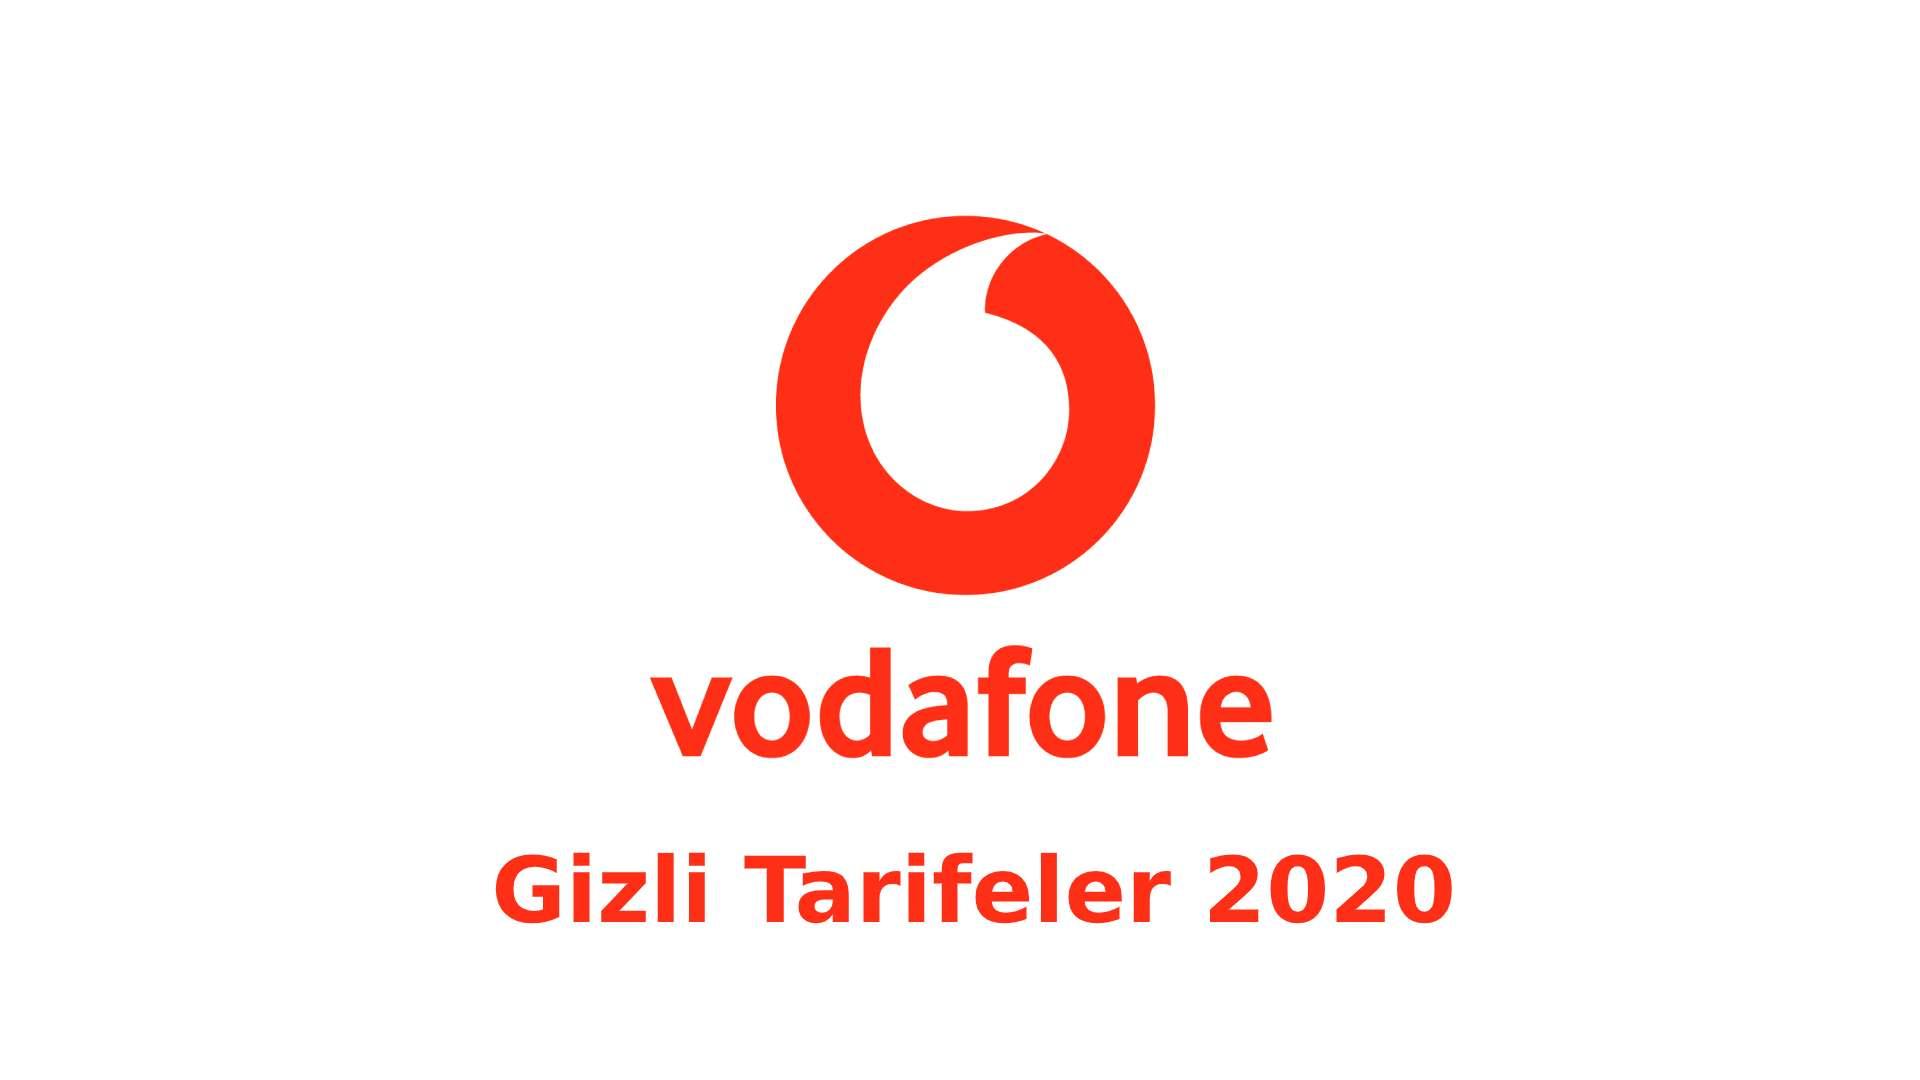 Vodafone Gizli Tarifeler 2020 vodafone gizli tarifeler 2020